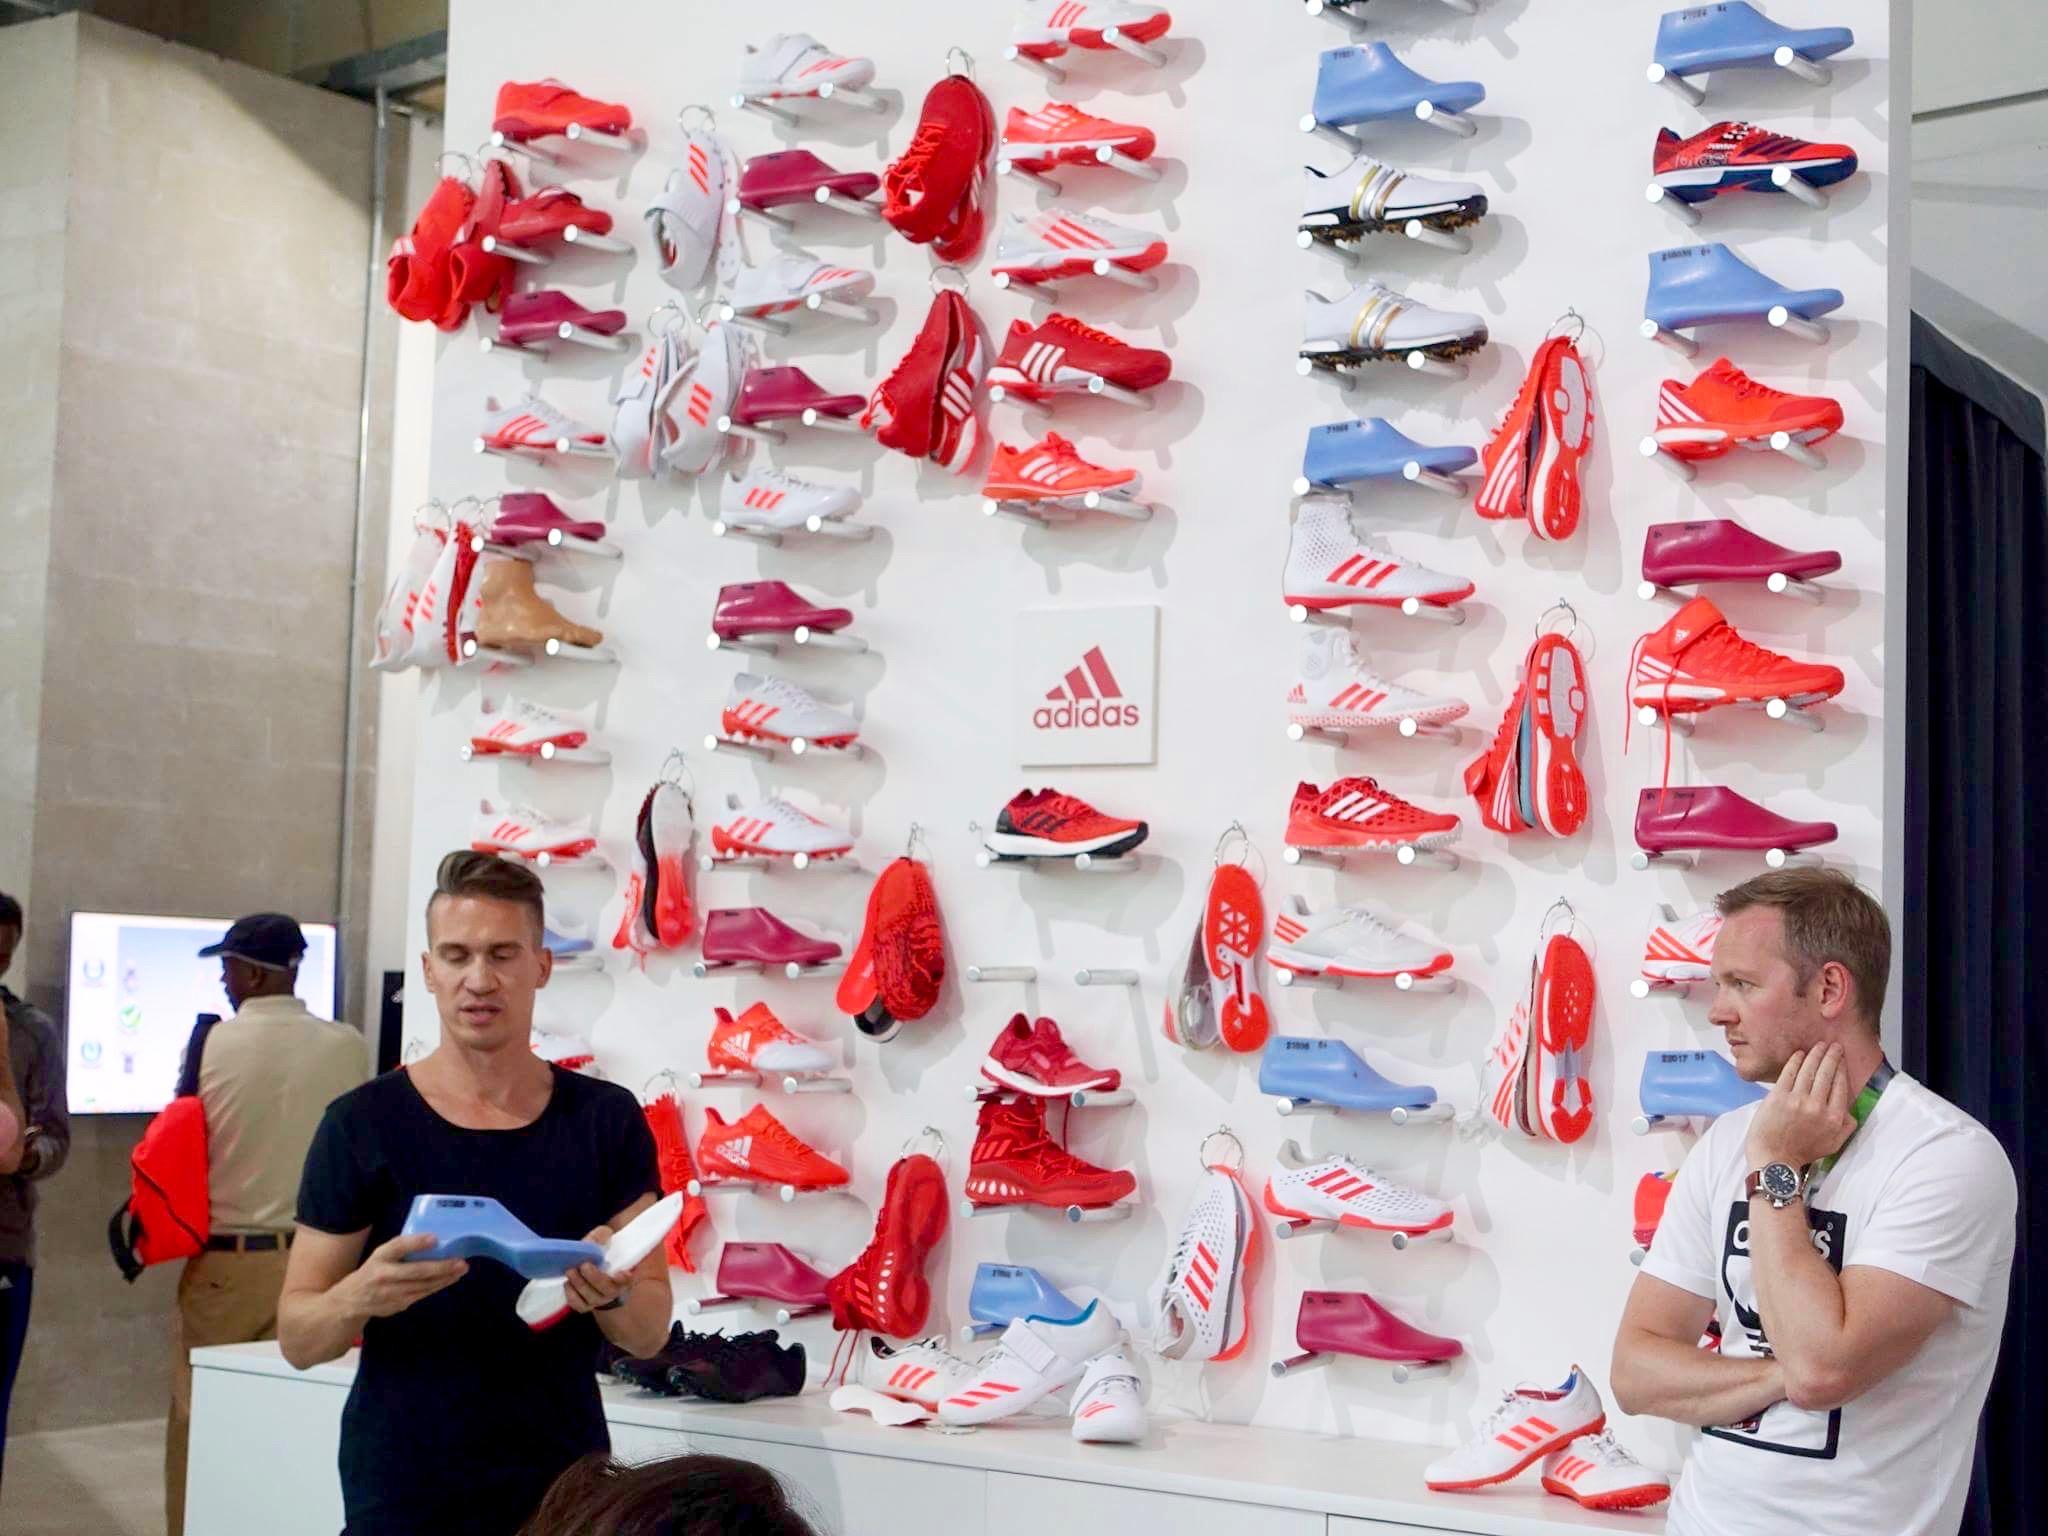 Rio mit adidas